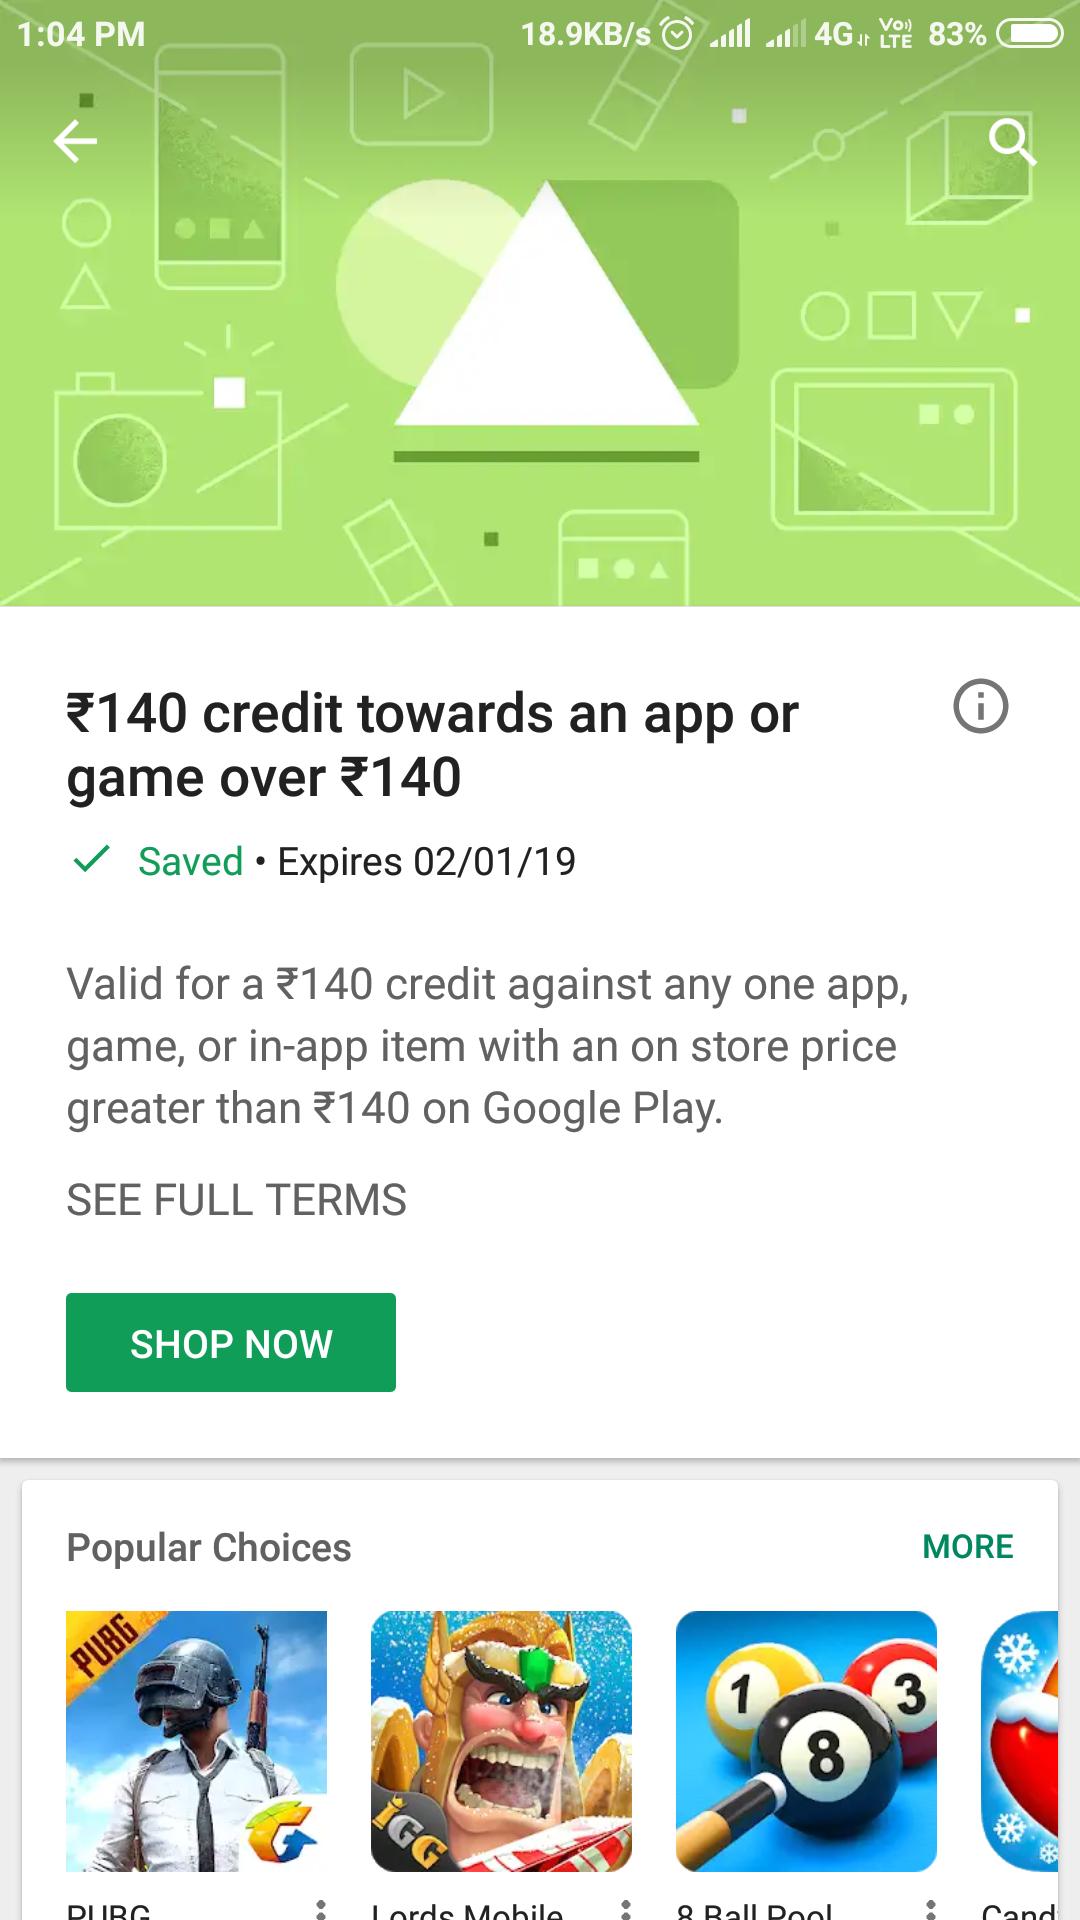 https://cdn0.desidime.com/attachments/photos/543618/original/Screenshot_2018-12-24-13-04-42-854_com.android.vending.png?1545637064